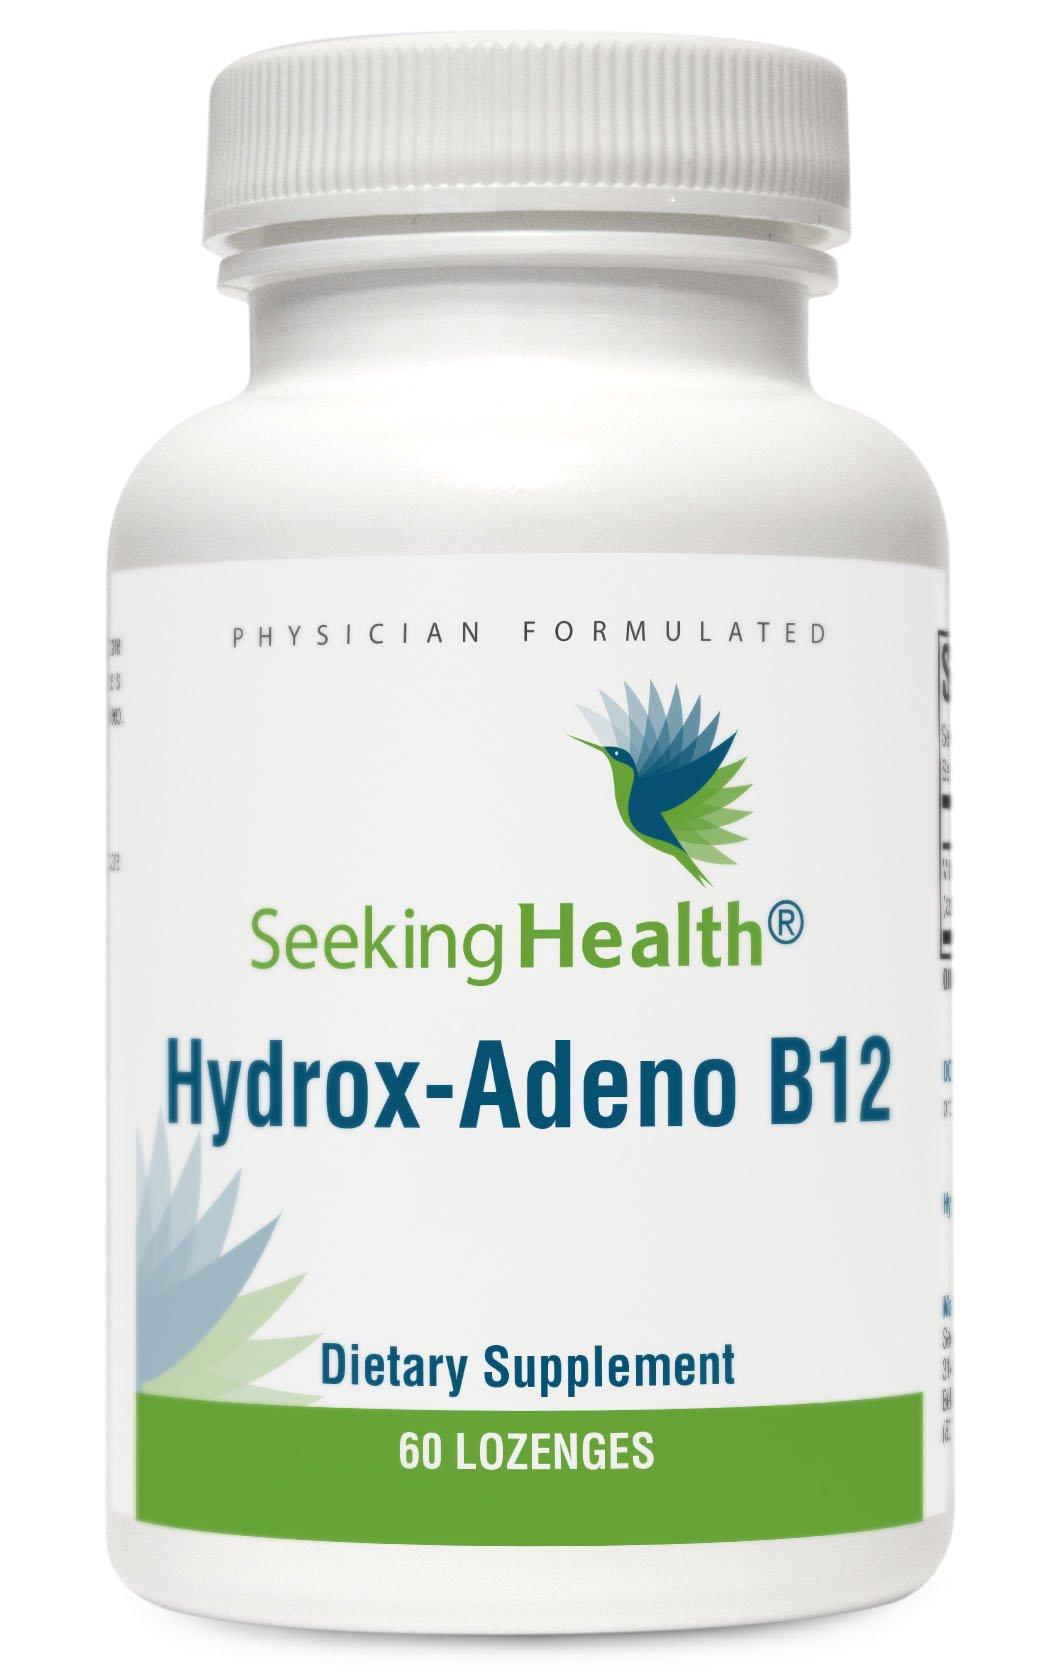 Seeking Health Hydrox-Adeno B12 | 60 Lozenges | Potent B-12 Vitamin | Adenosylcobalamin | MTHFR Supplements